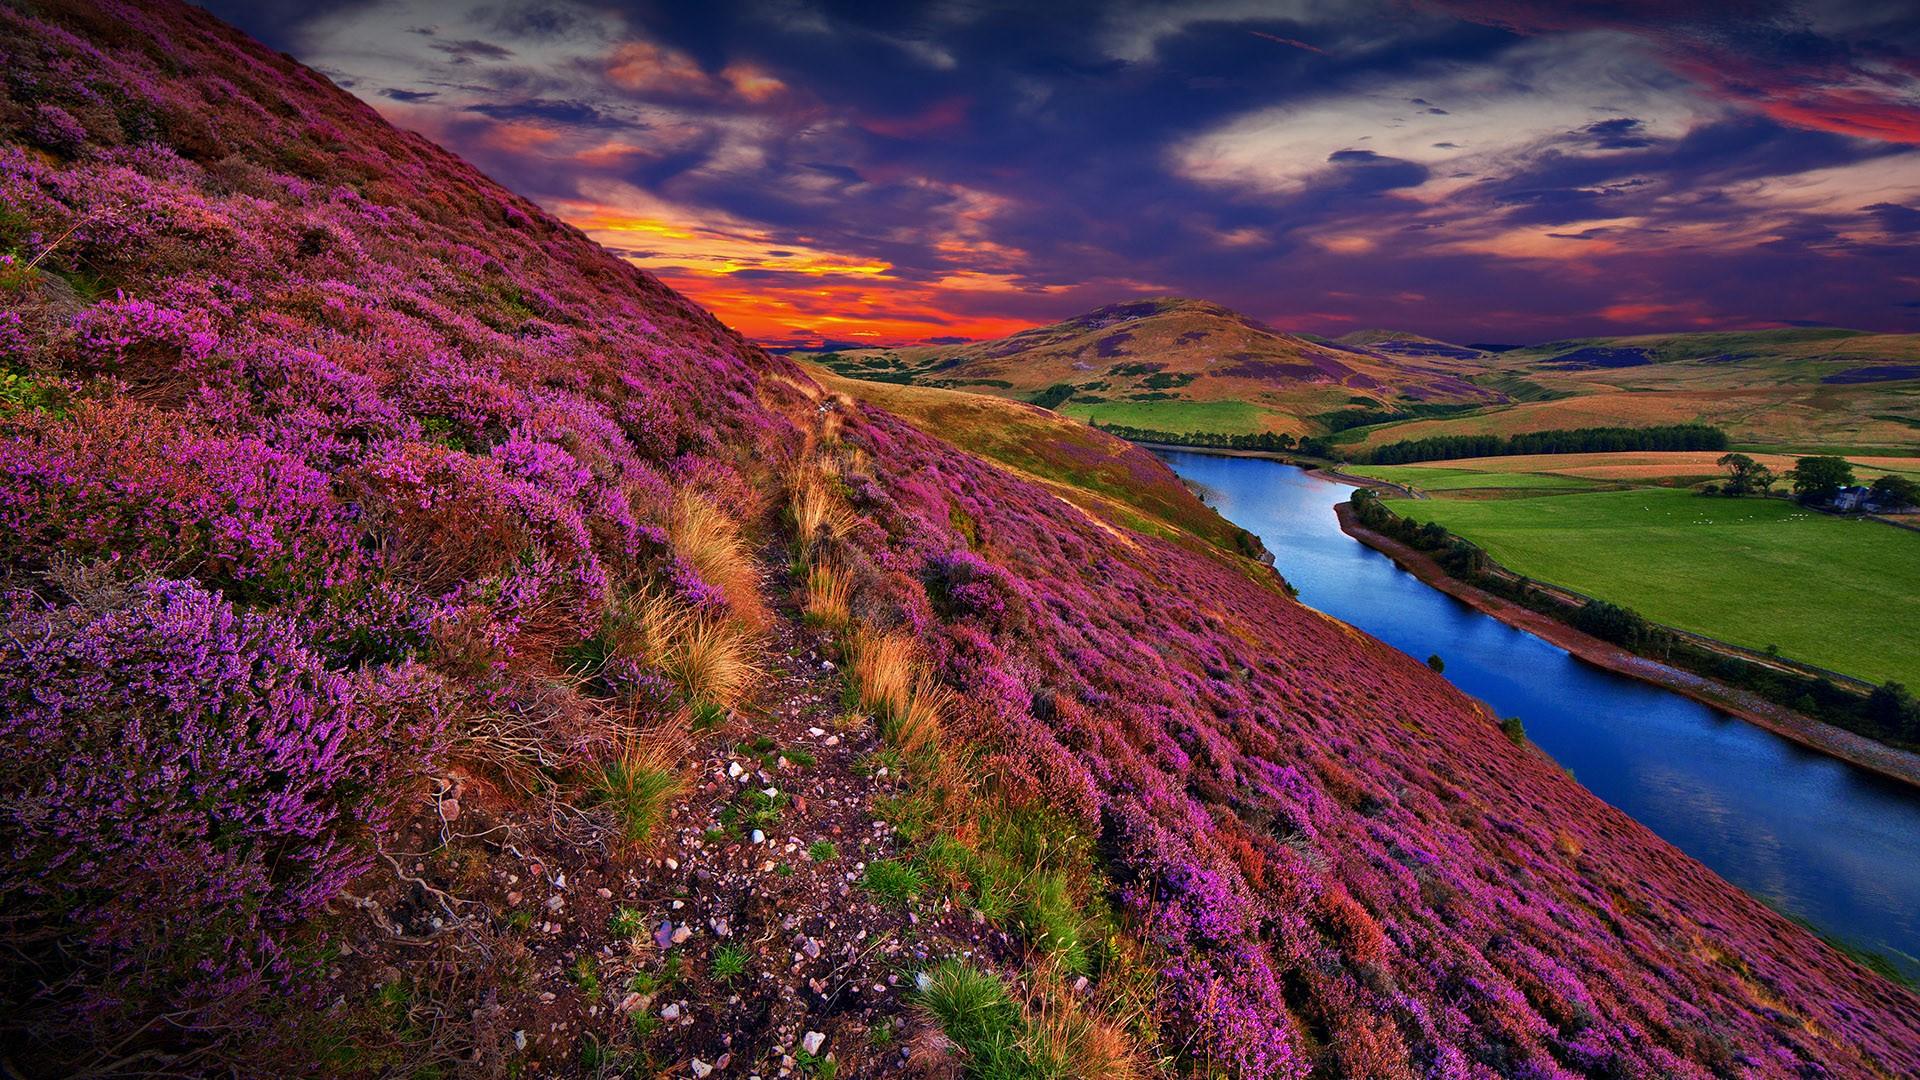 General 1920x1080 nature landscape clouds sunset flowers river water grass hills trees Scotland UK Pentland Hills colorful